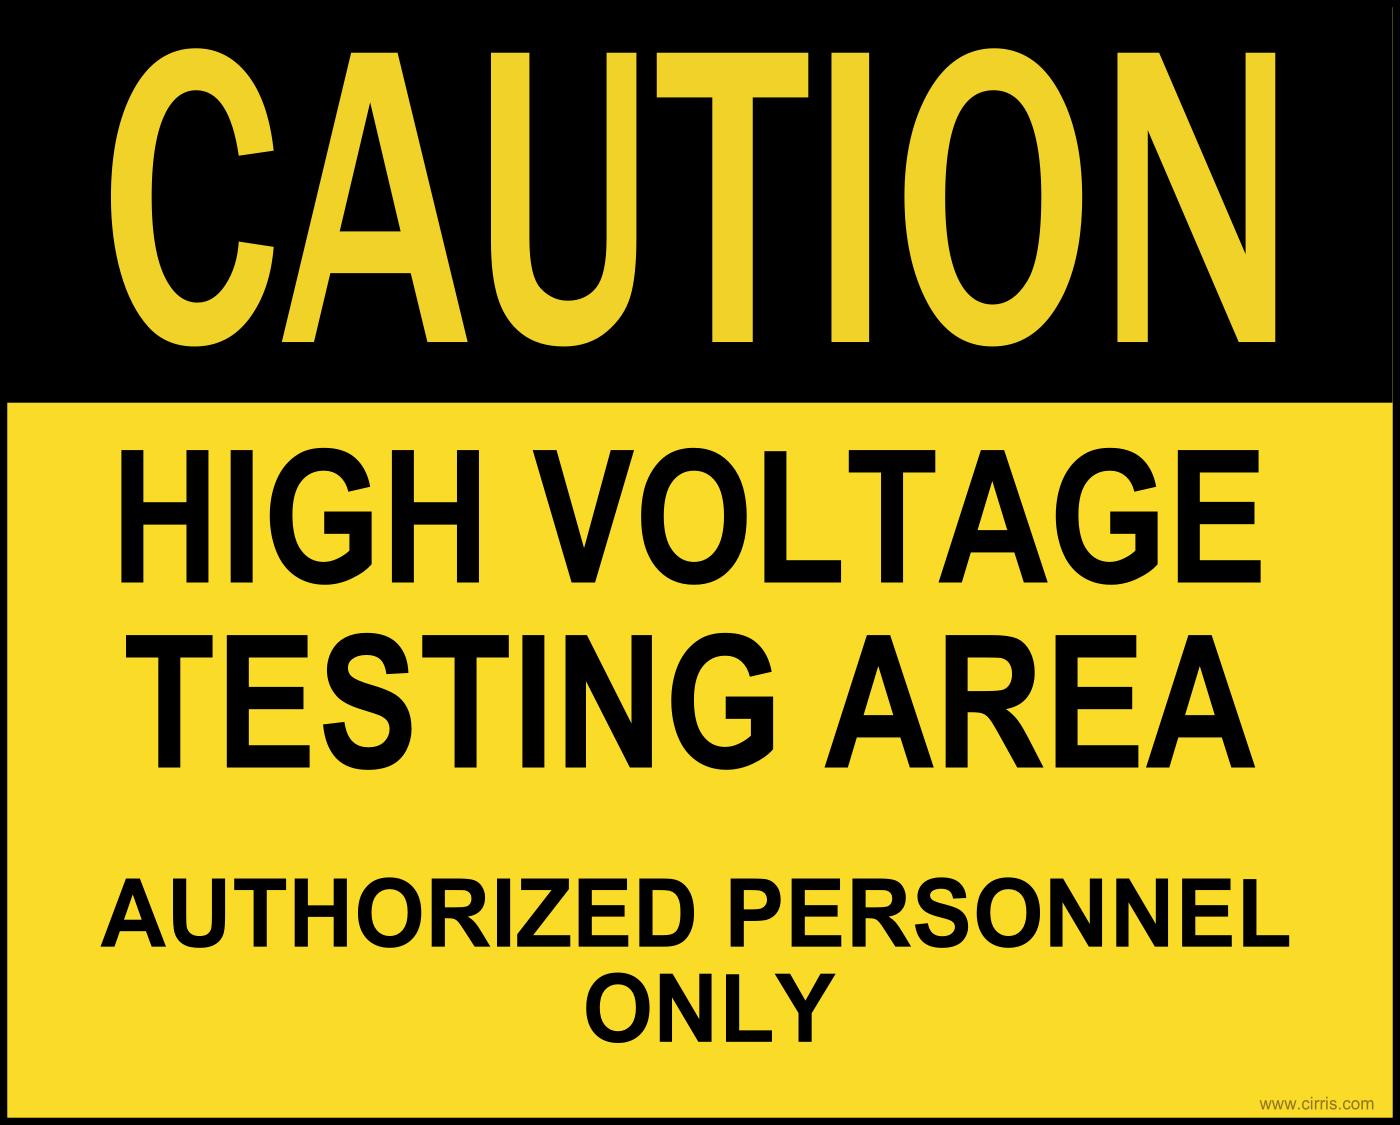 caution_high_voltage_area.png